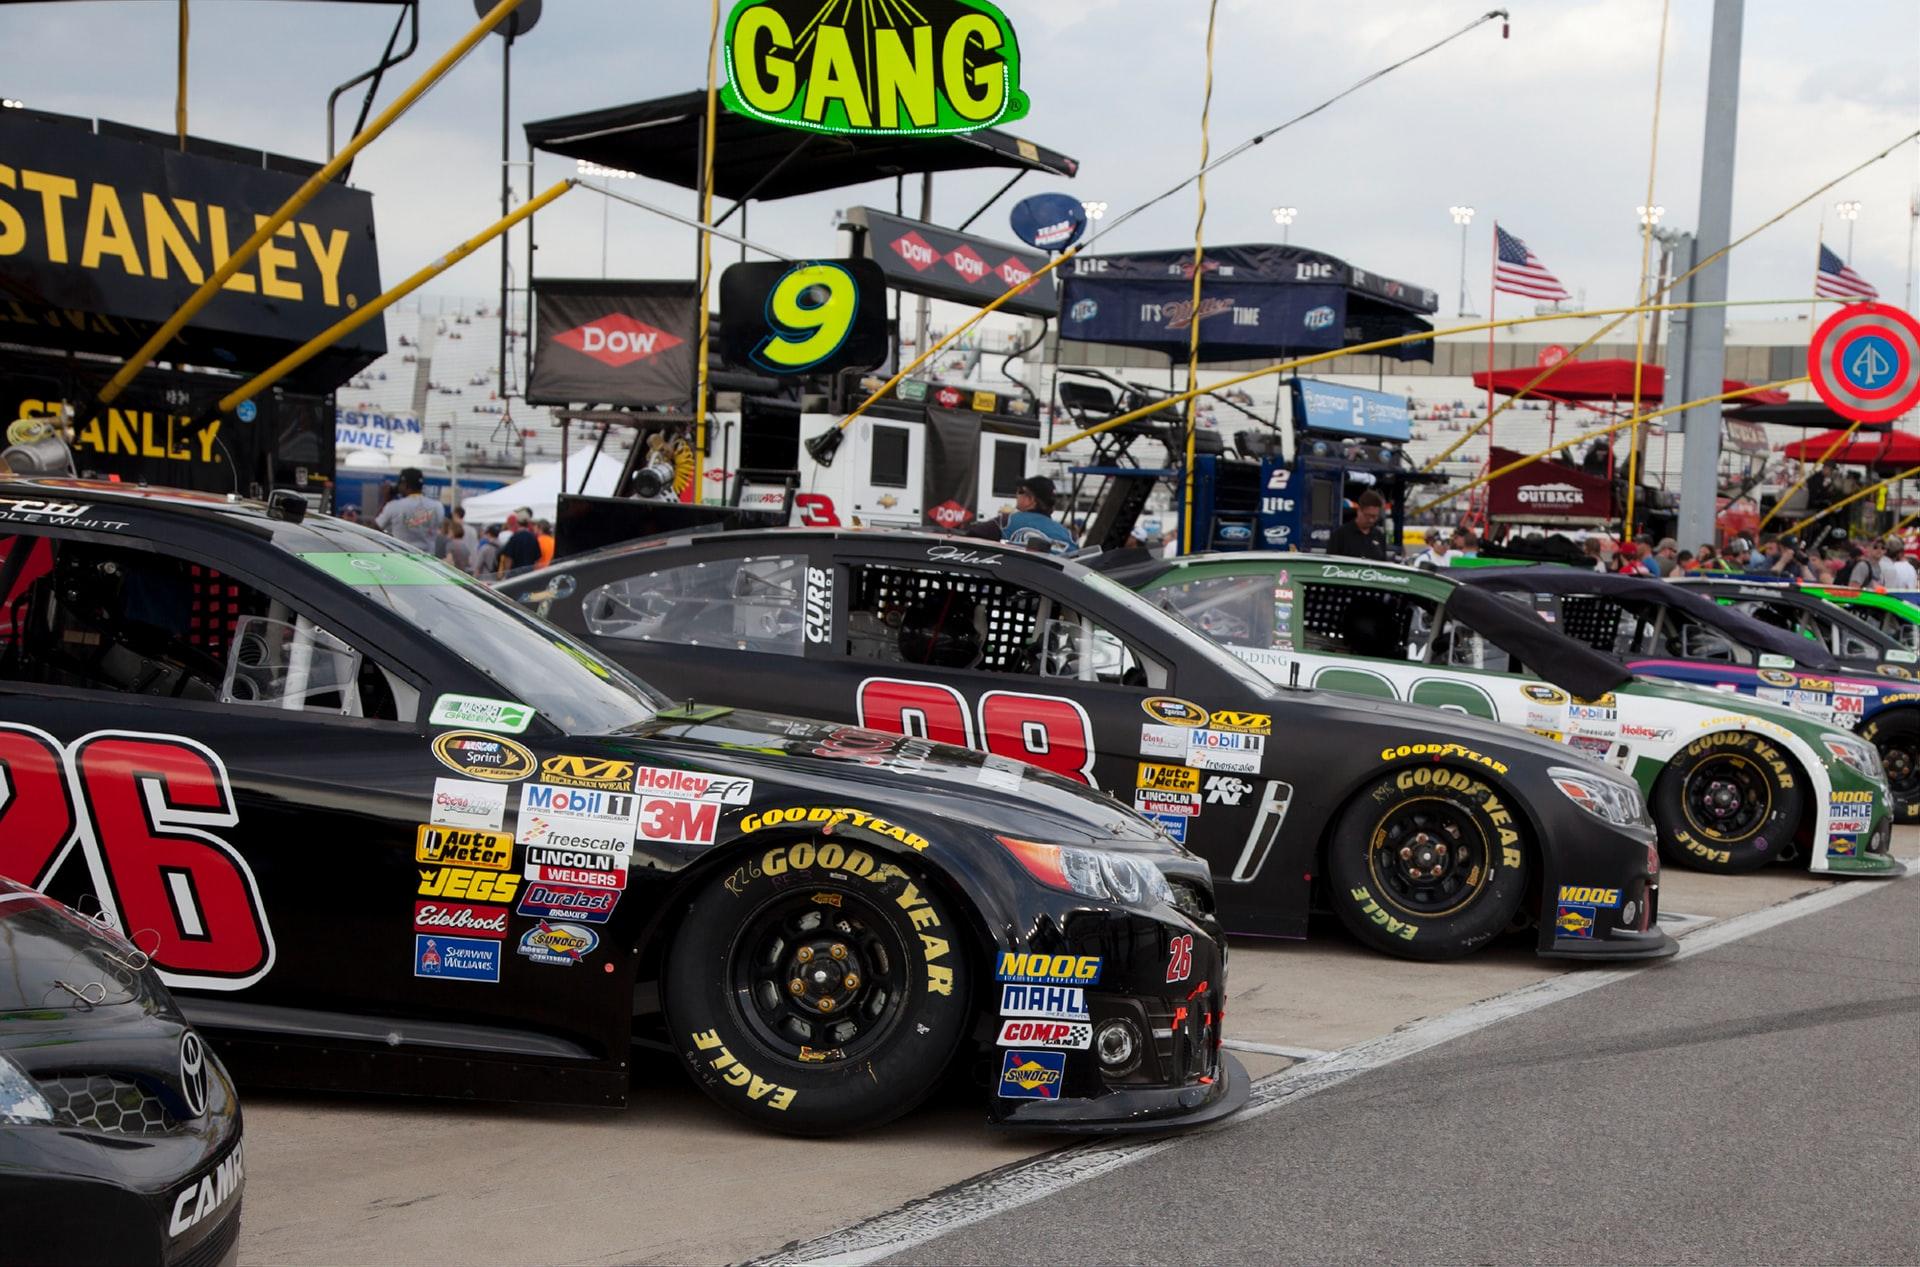 Value of the five largest NASCAR racing teams surpass $1 billion www.brandspurng.com